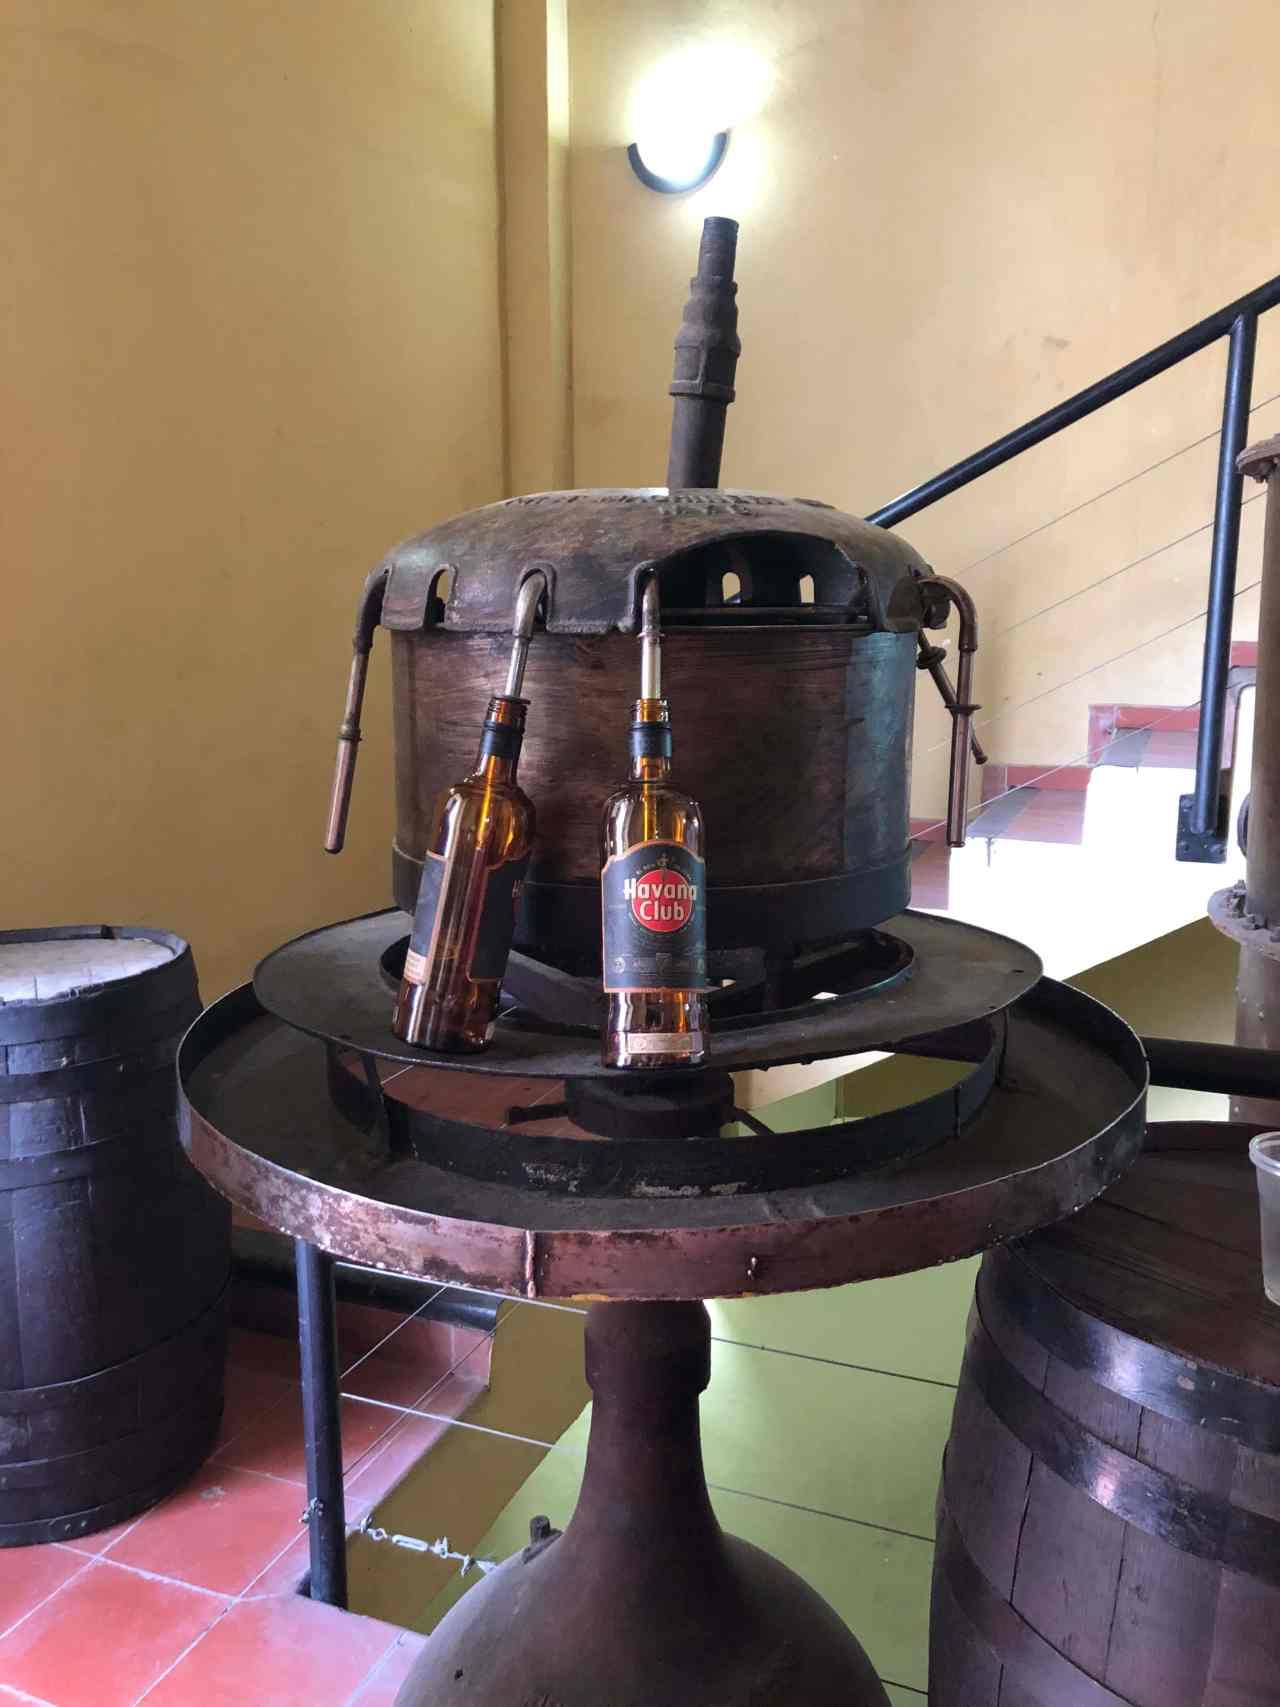 Havana Club Rum Museum